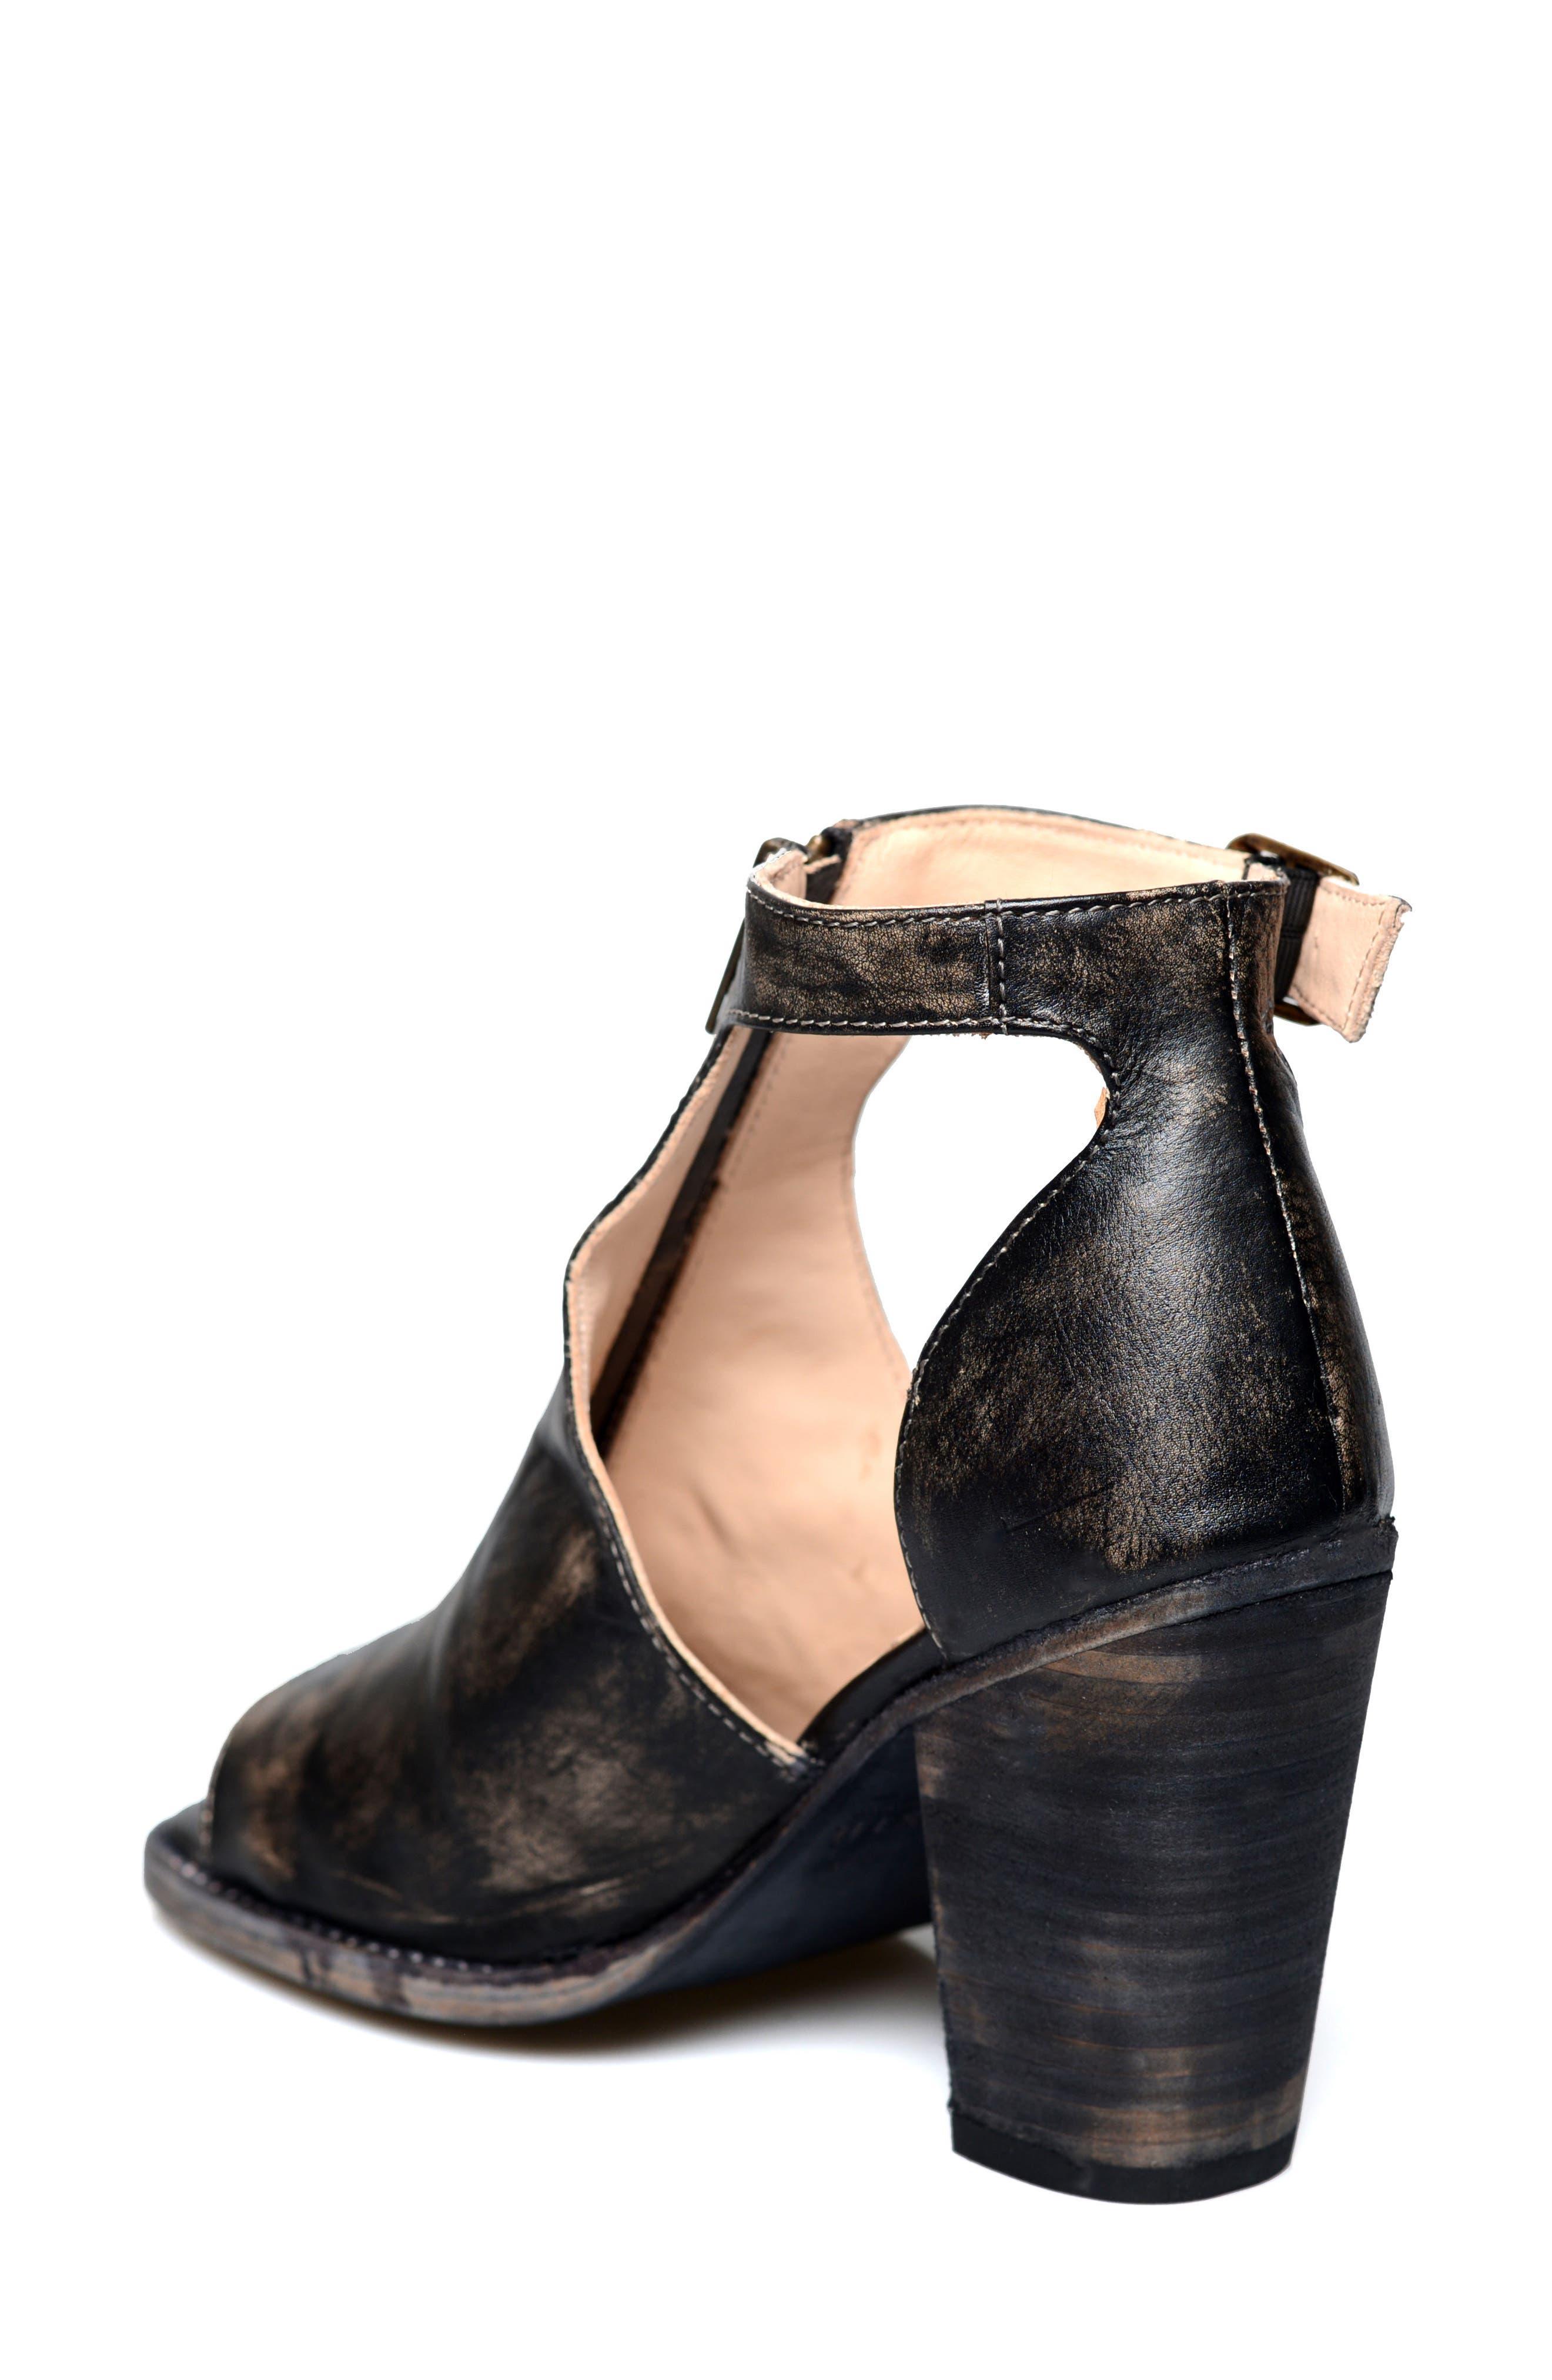 Olena Open Toe Bootie,                             Alternate thumbnail 2, color,                             Black Leather